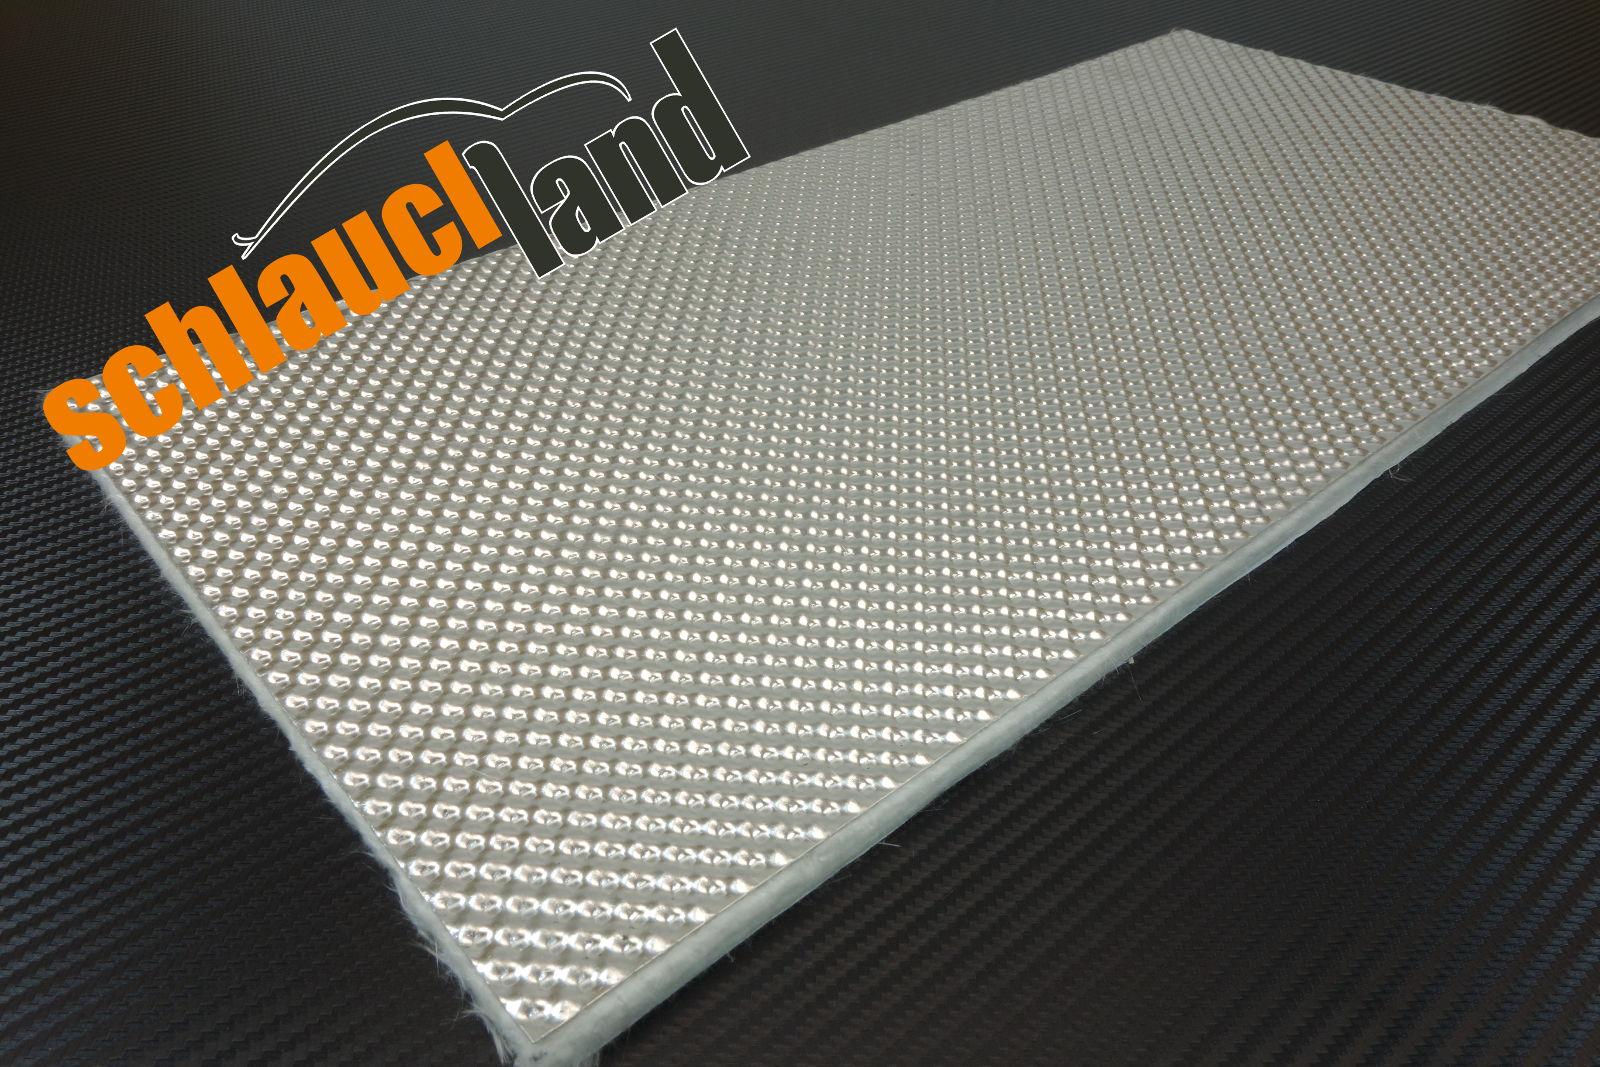 Alu-Keramik Hitzeschutzmatte ULTRA selbstklebend 1,0m x 1,0m